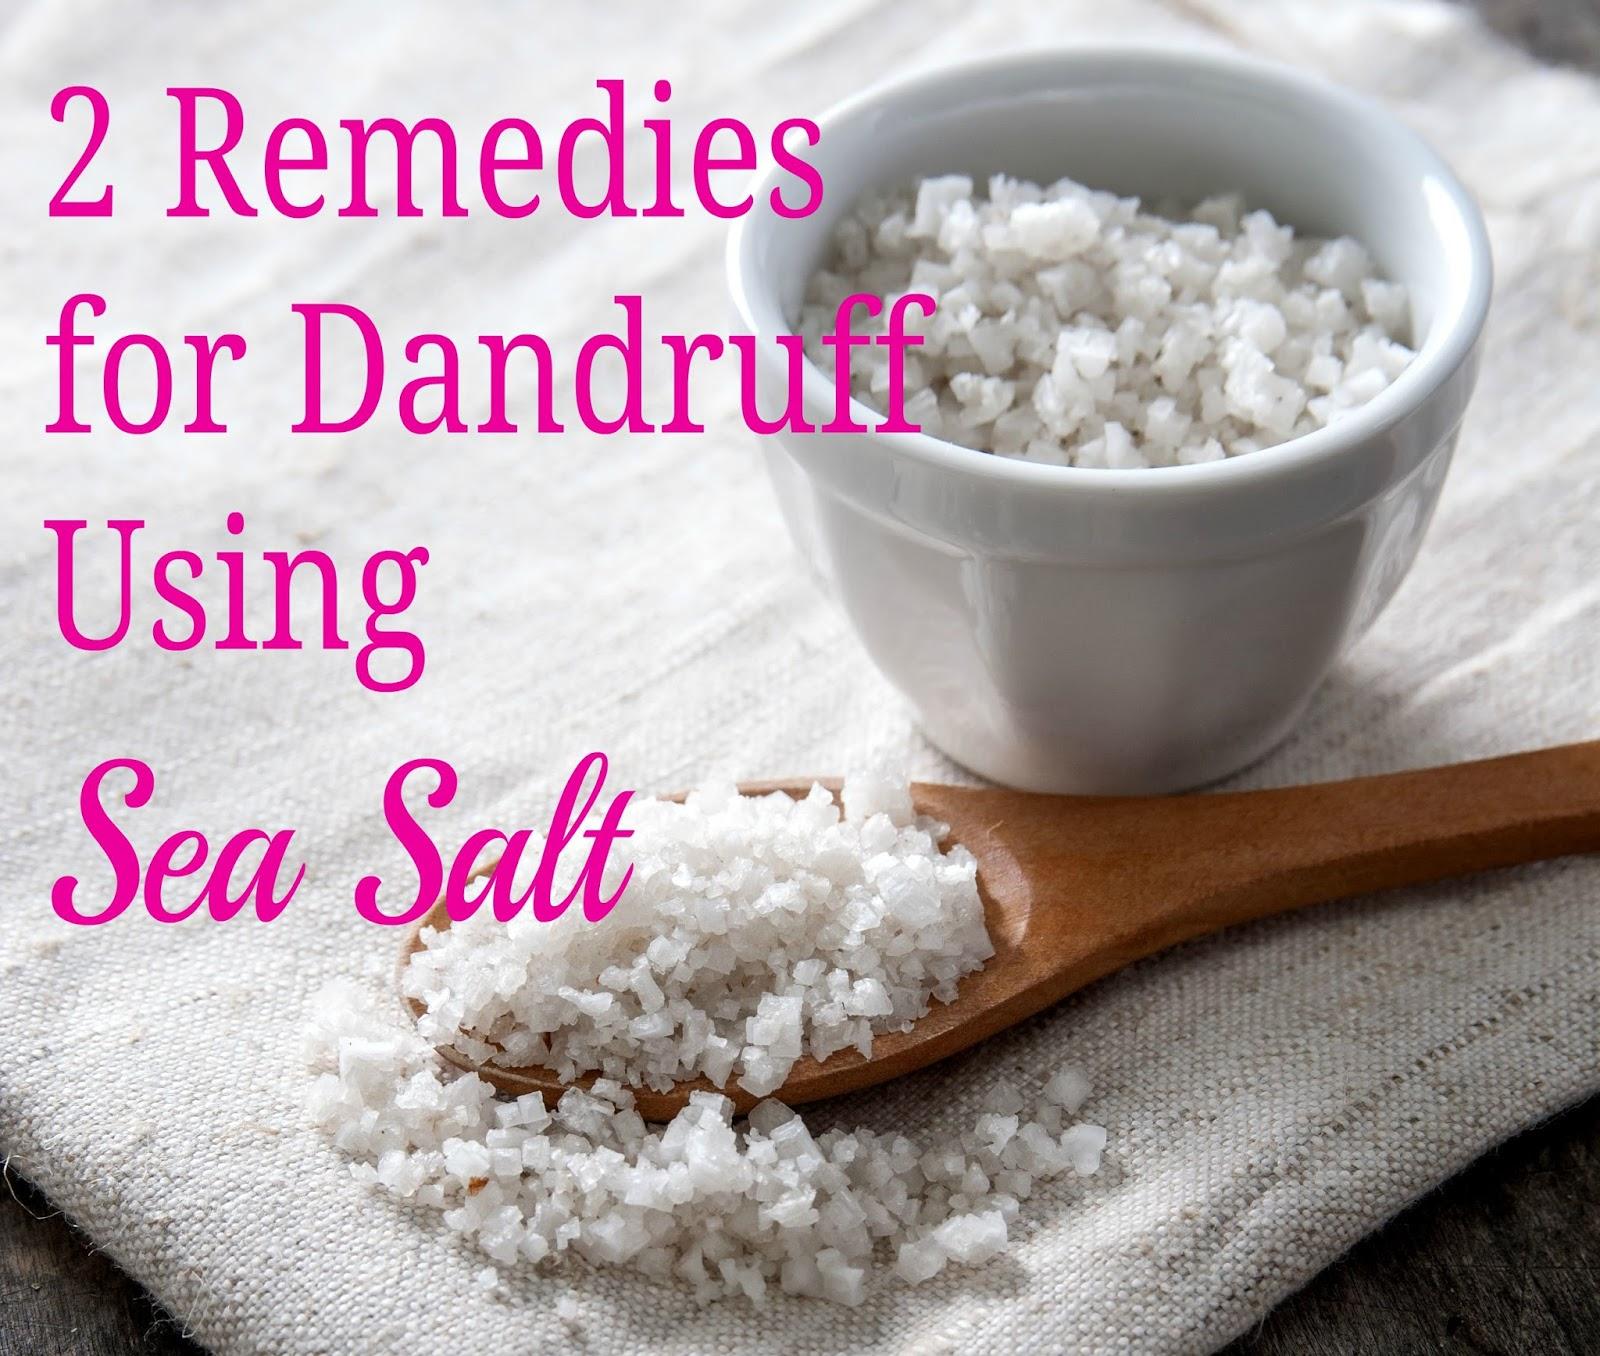 2 Remedies for Dandruff Using Sea Salt